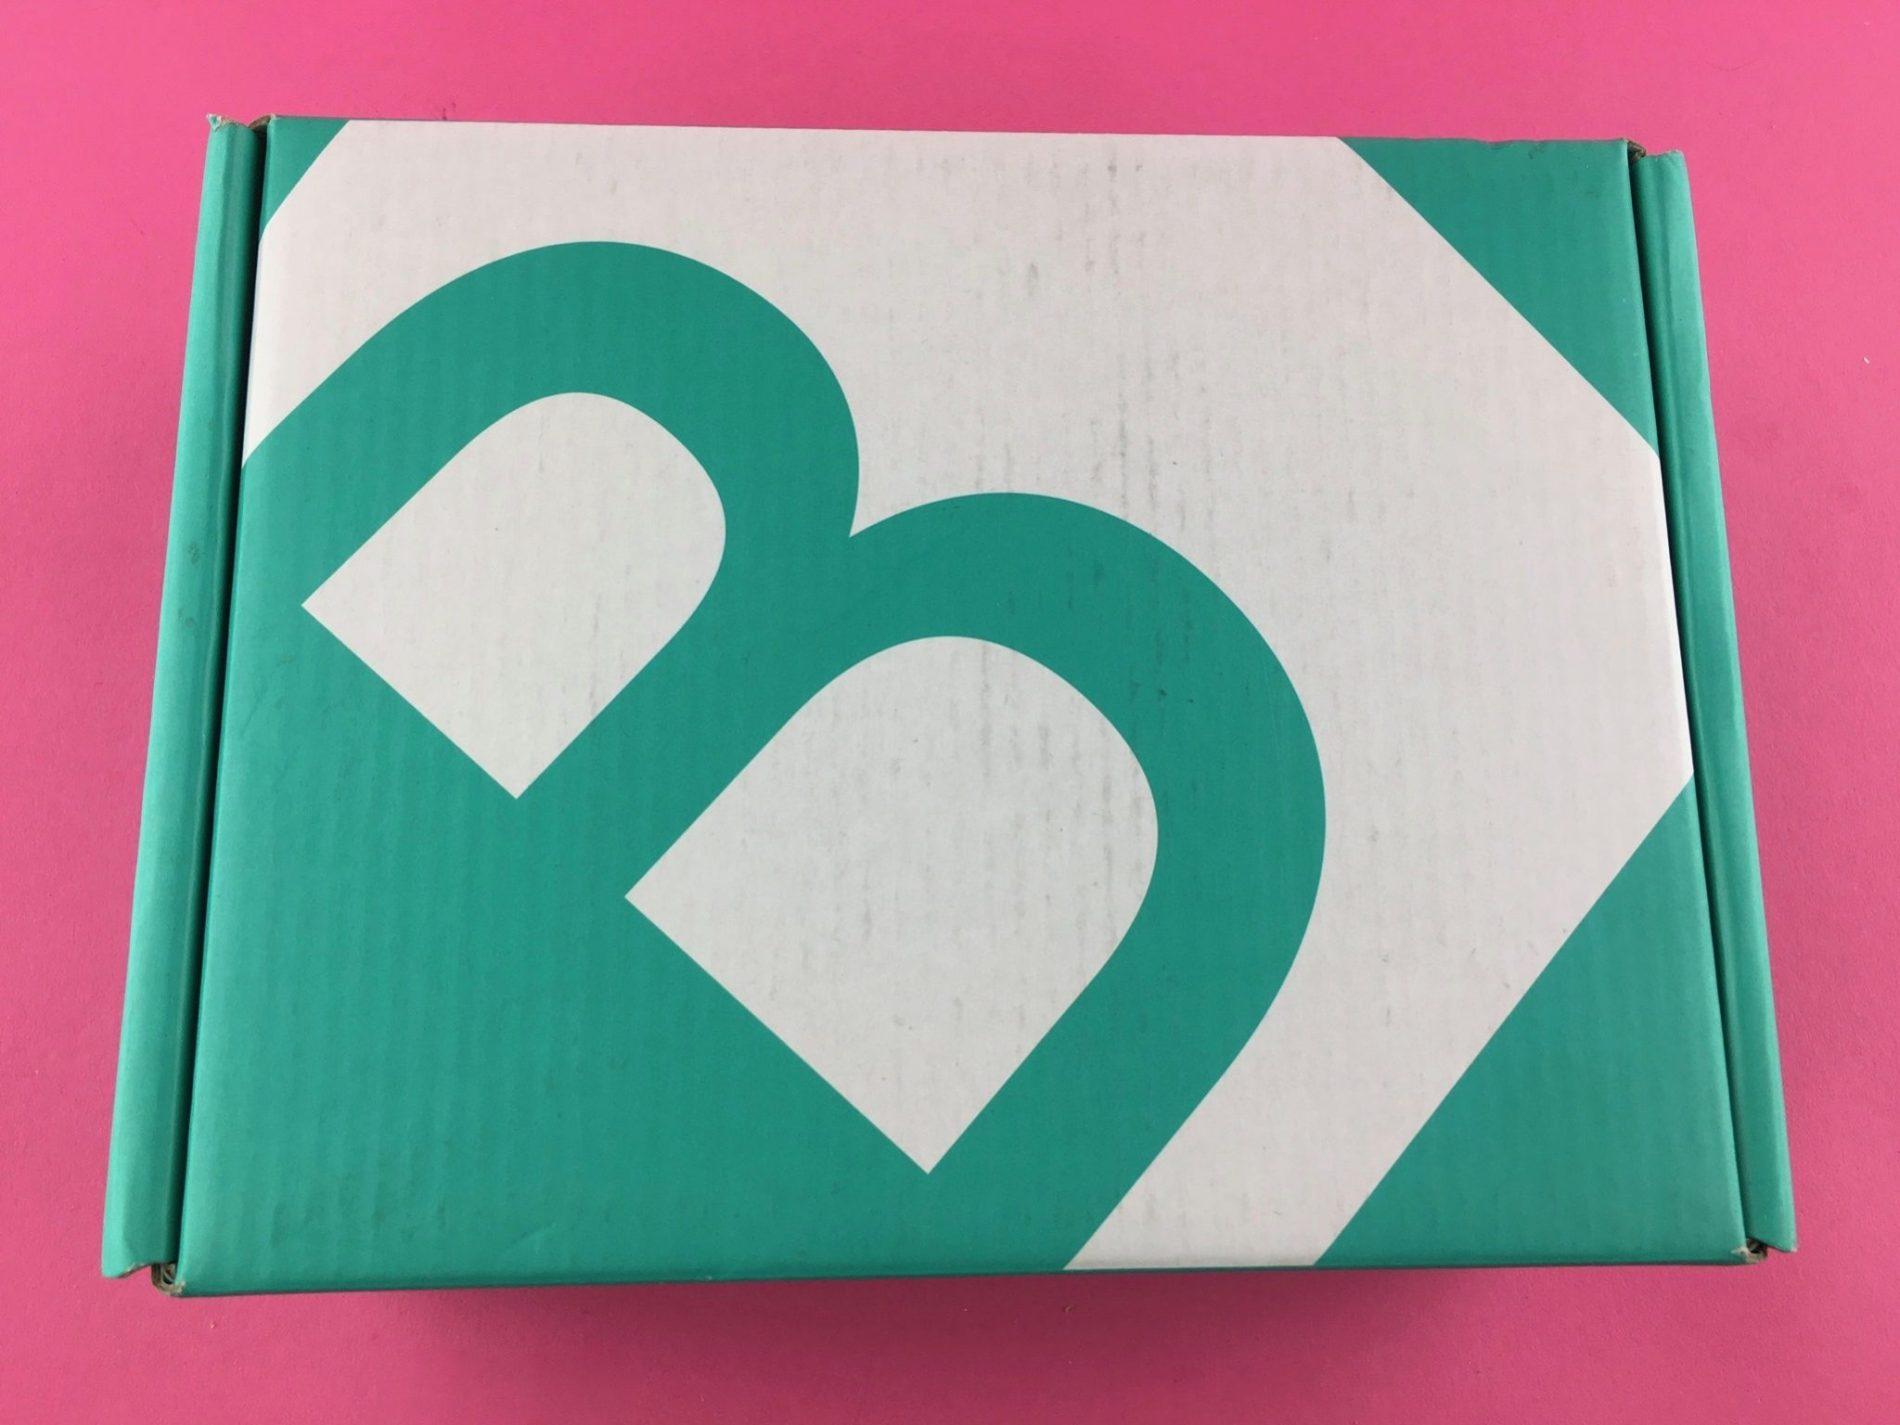 Your Bijoux Box February 2020 Spoiler #1